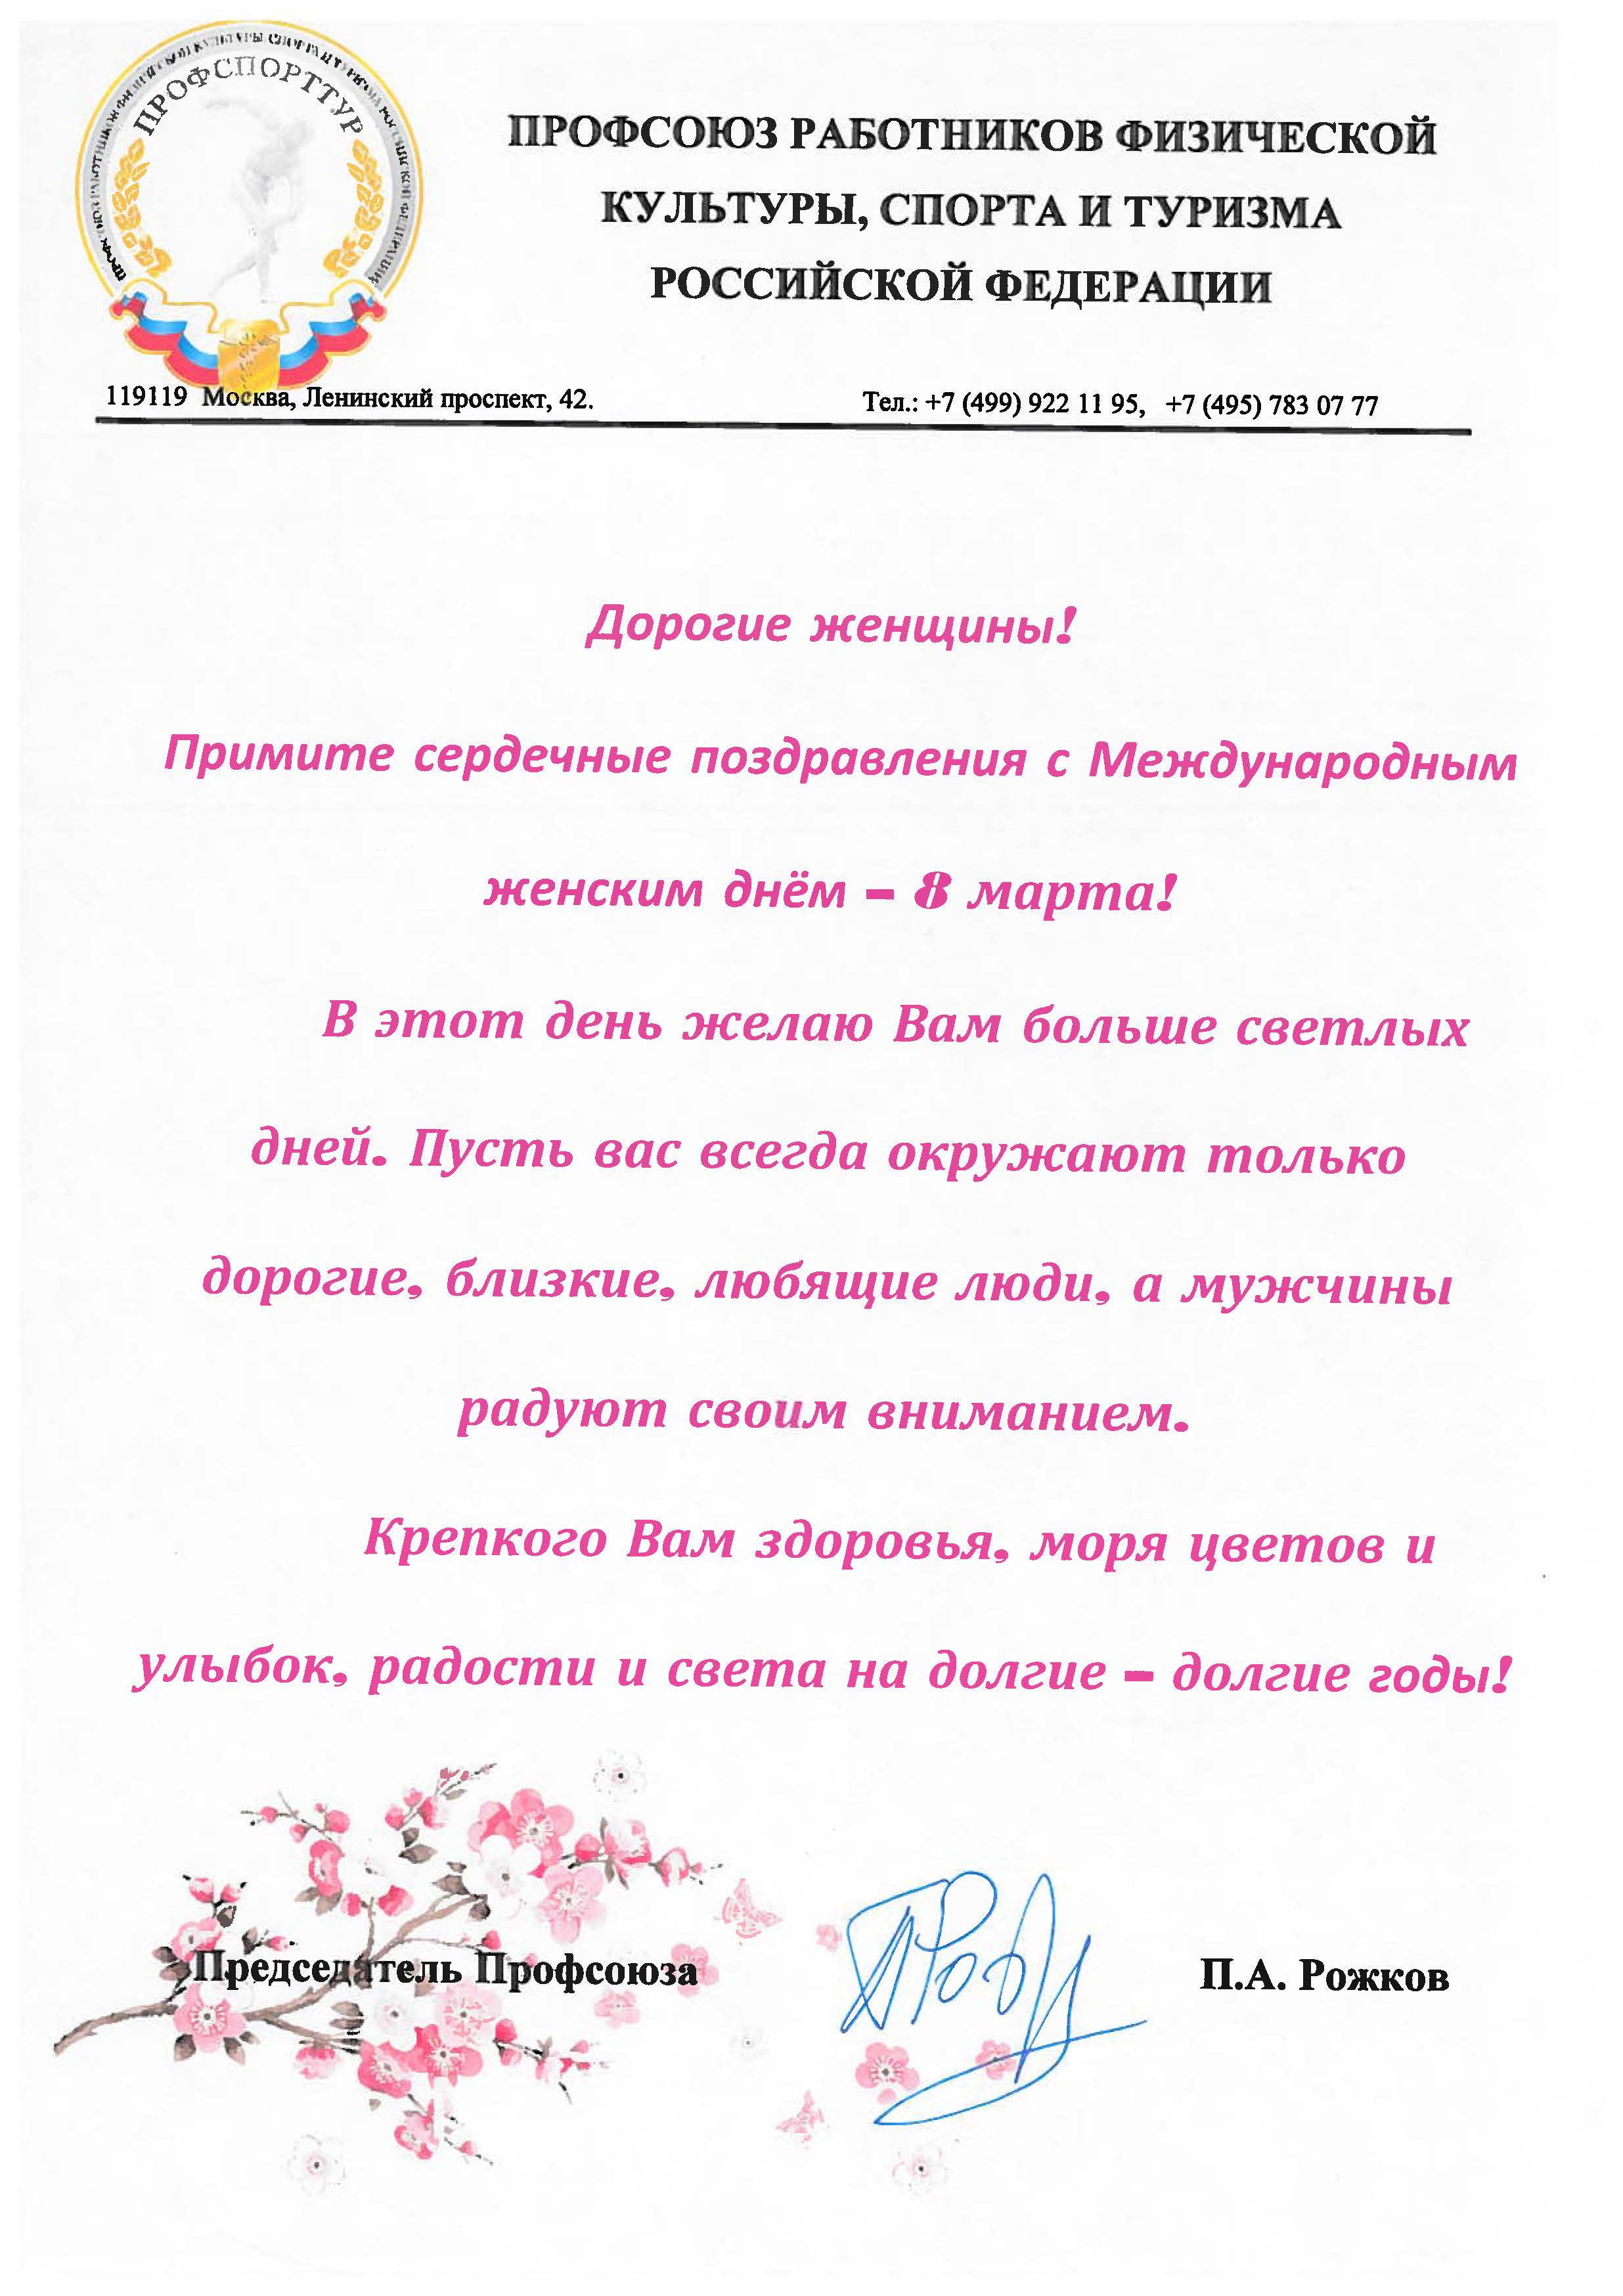 Картинки с 25 летием независимости казахстана